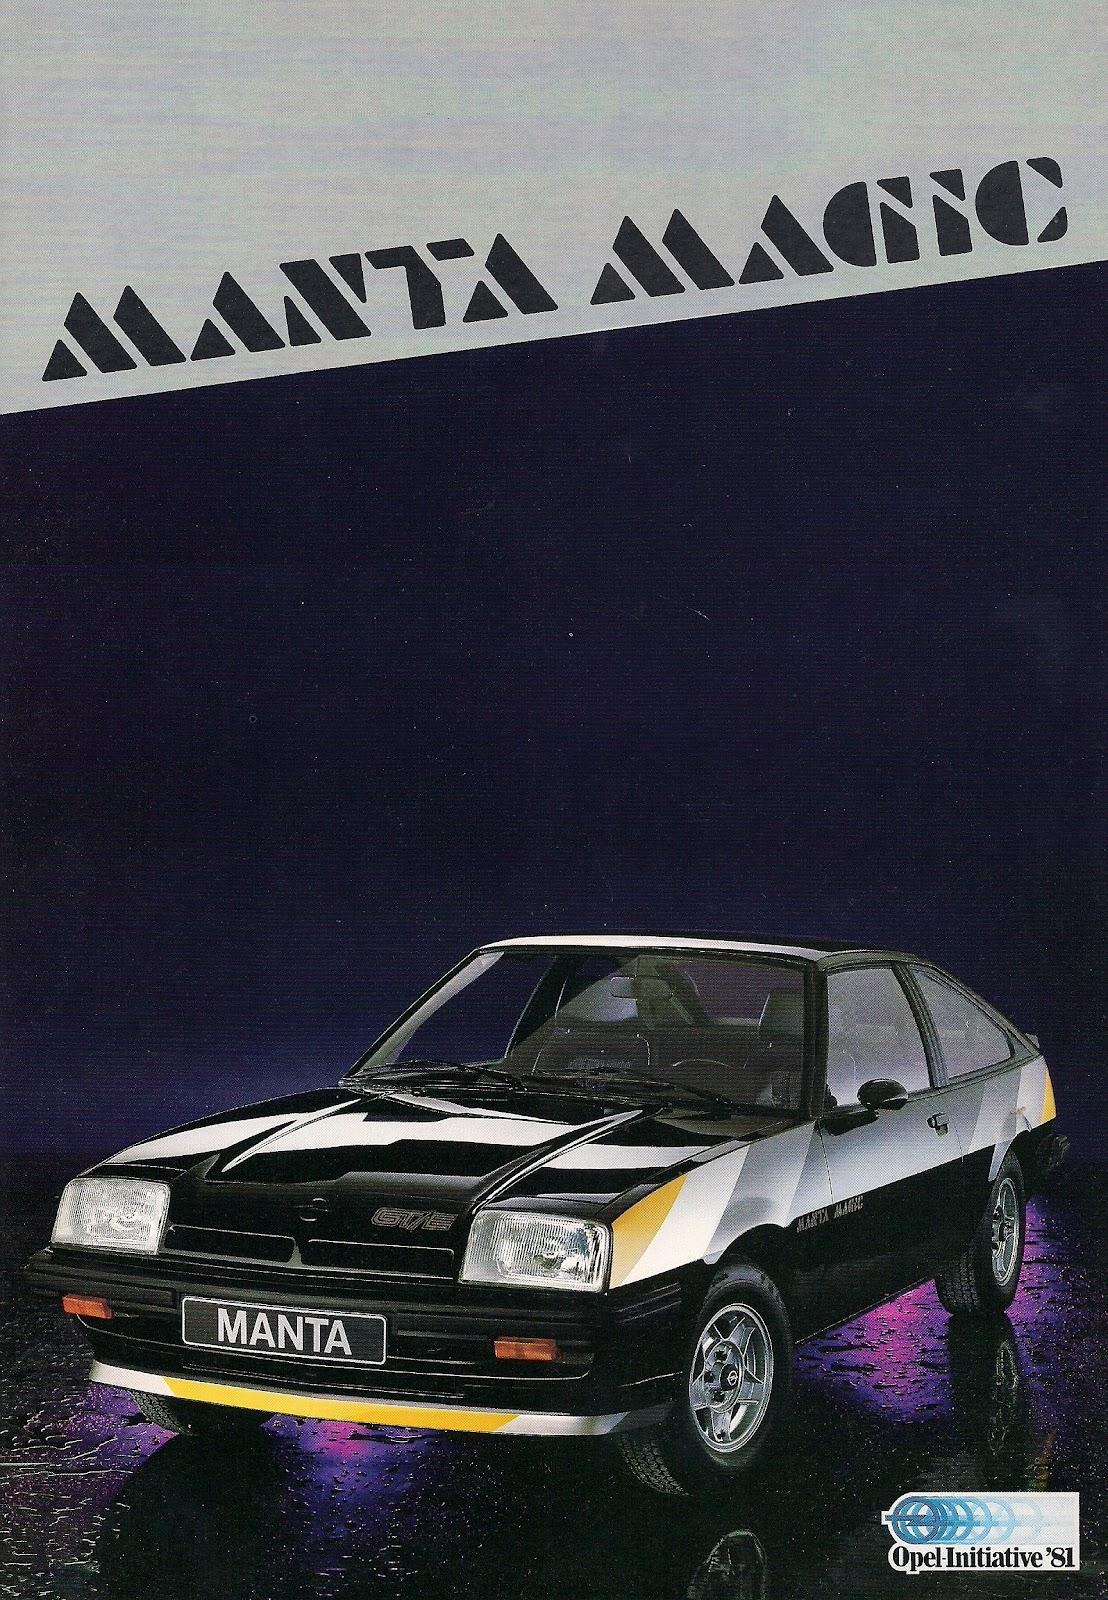 1981-Opel-Manta-Magic-GTE.jpg